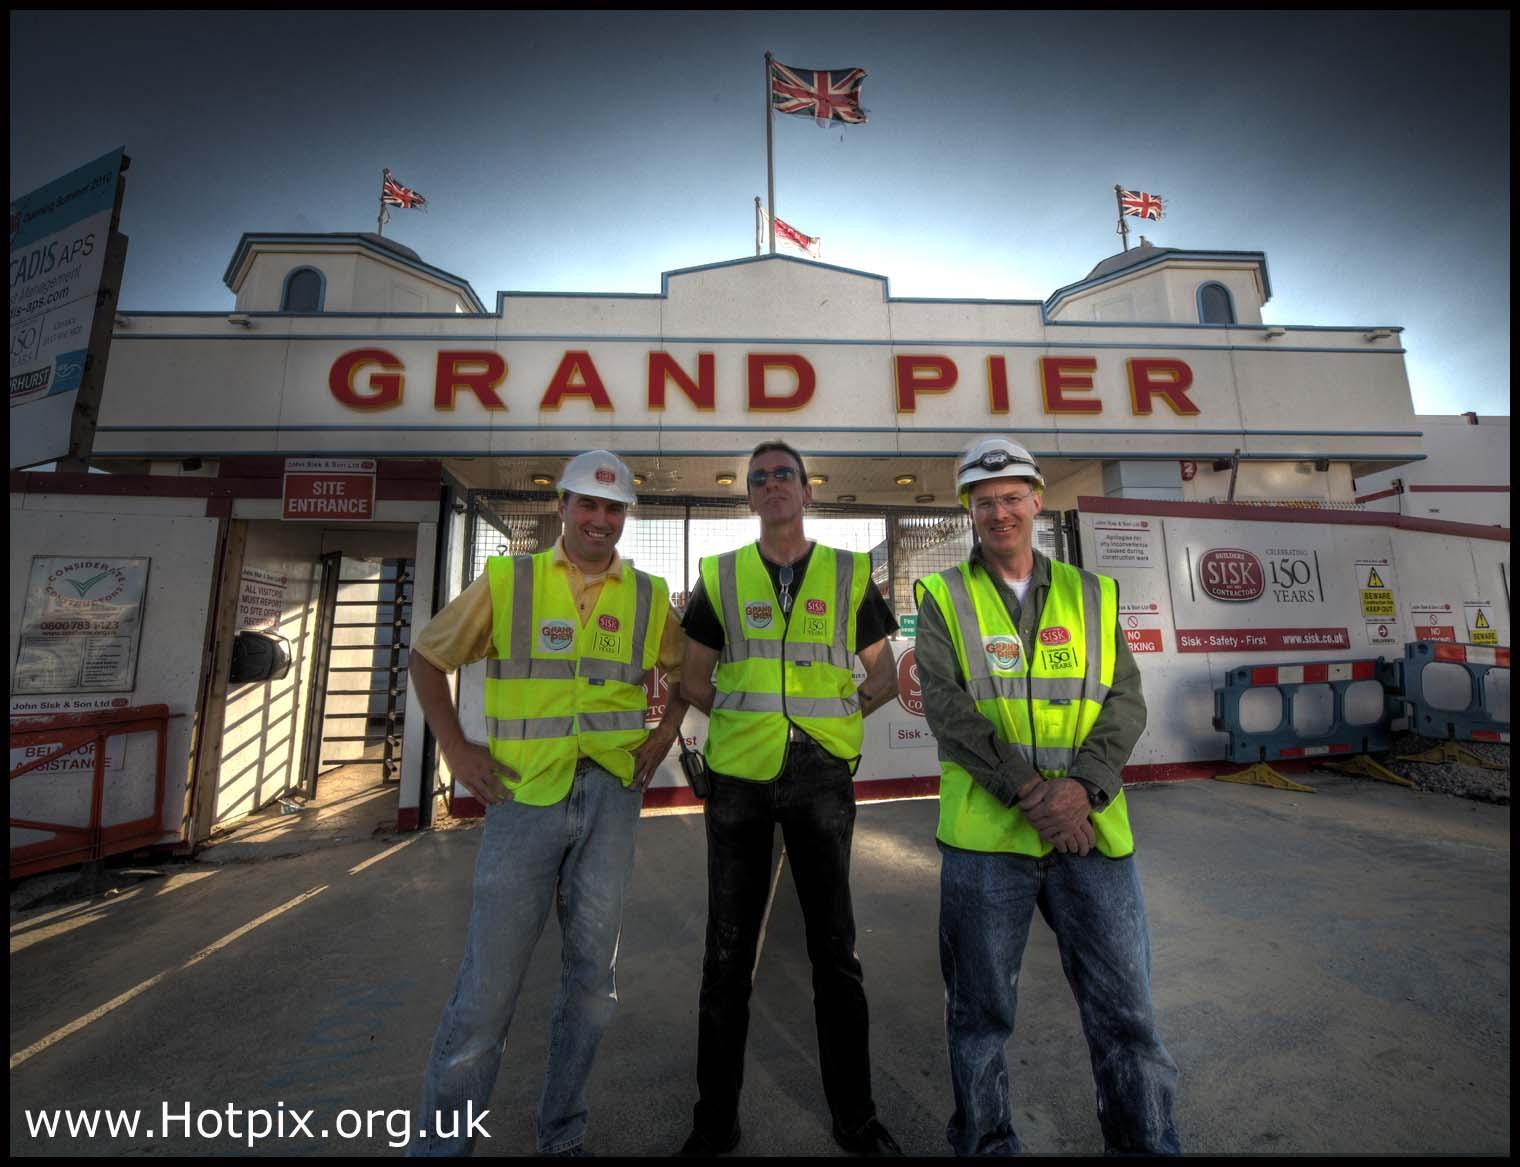 pier,weston,super,mare,westonsupermare,sea,side,seaside,english,england,UK,britain,british,building,project,village,people,gay,icon,icons,builders,mate,reflective,jackets,jacket,health,safety,hotpix!,#tonysmith,#tonysmithhotpix